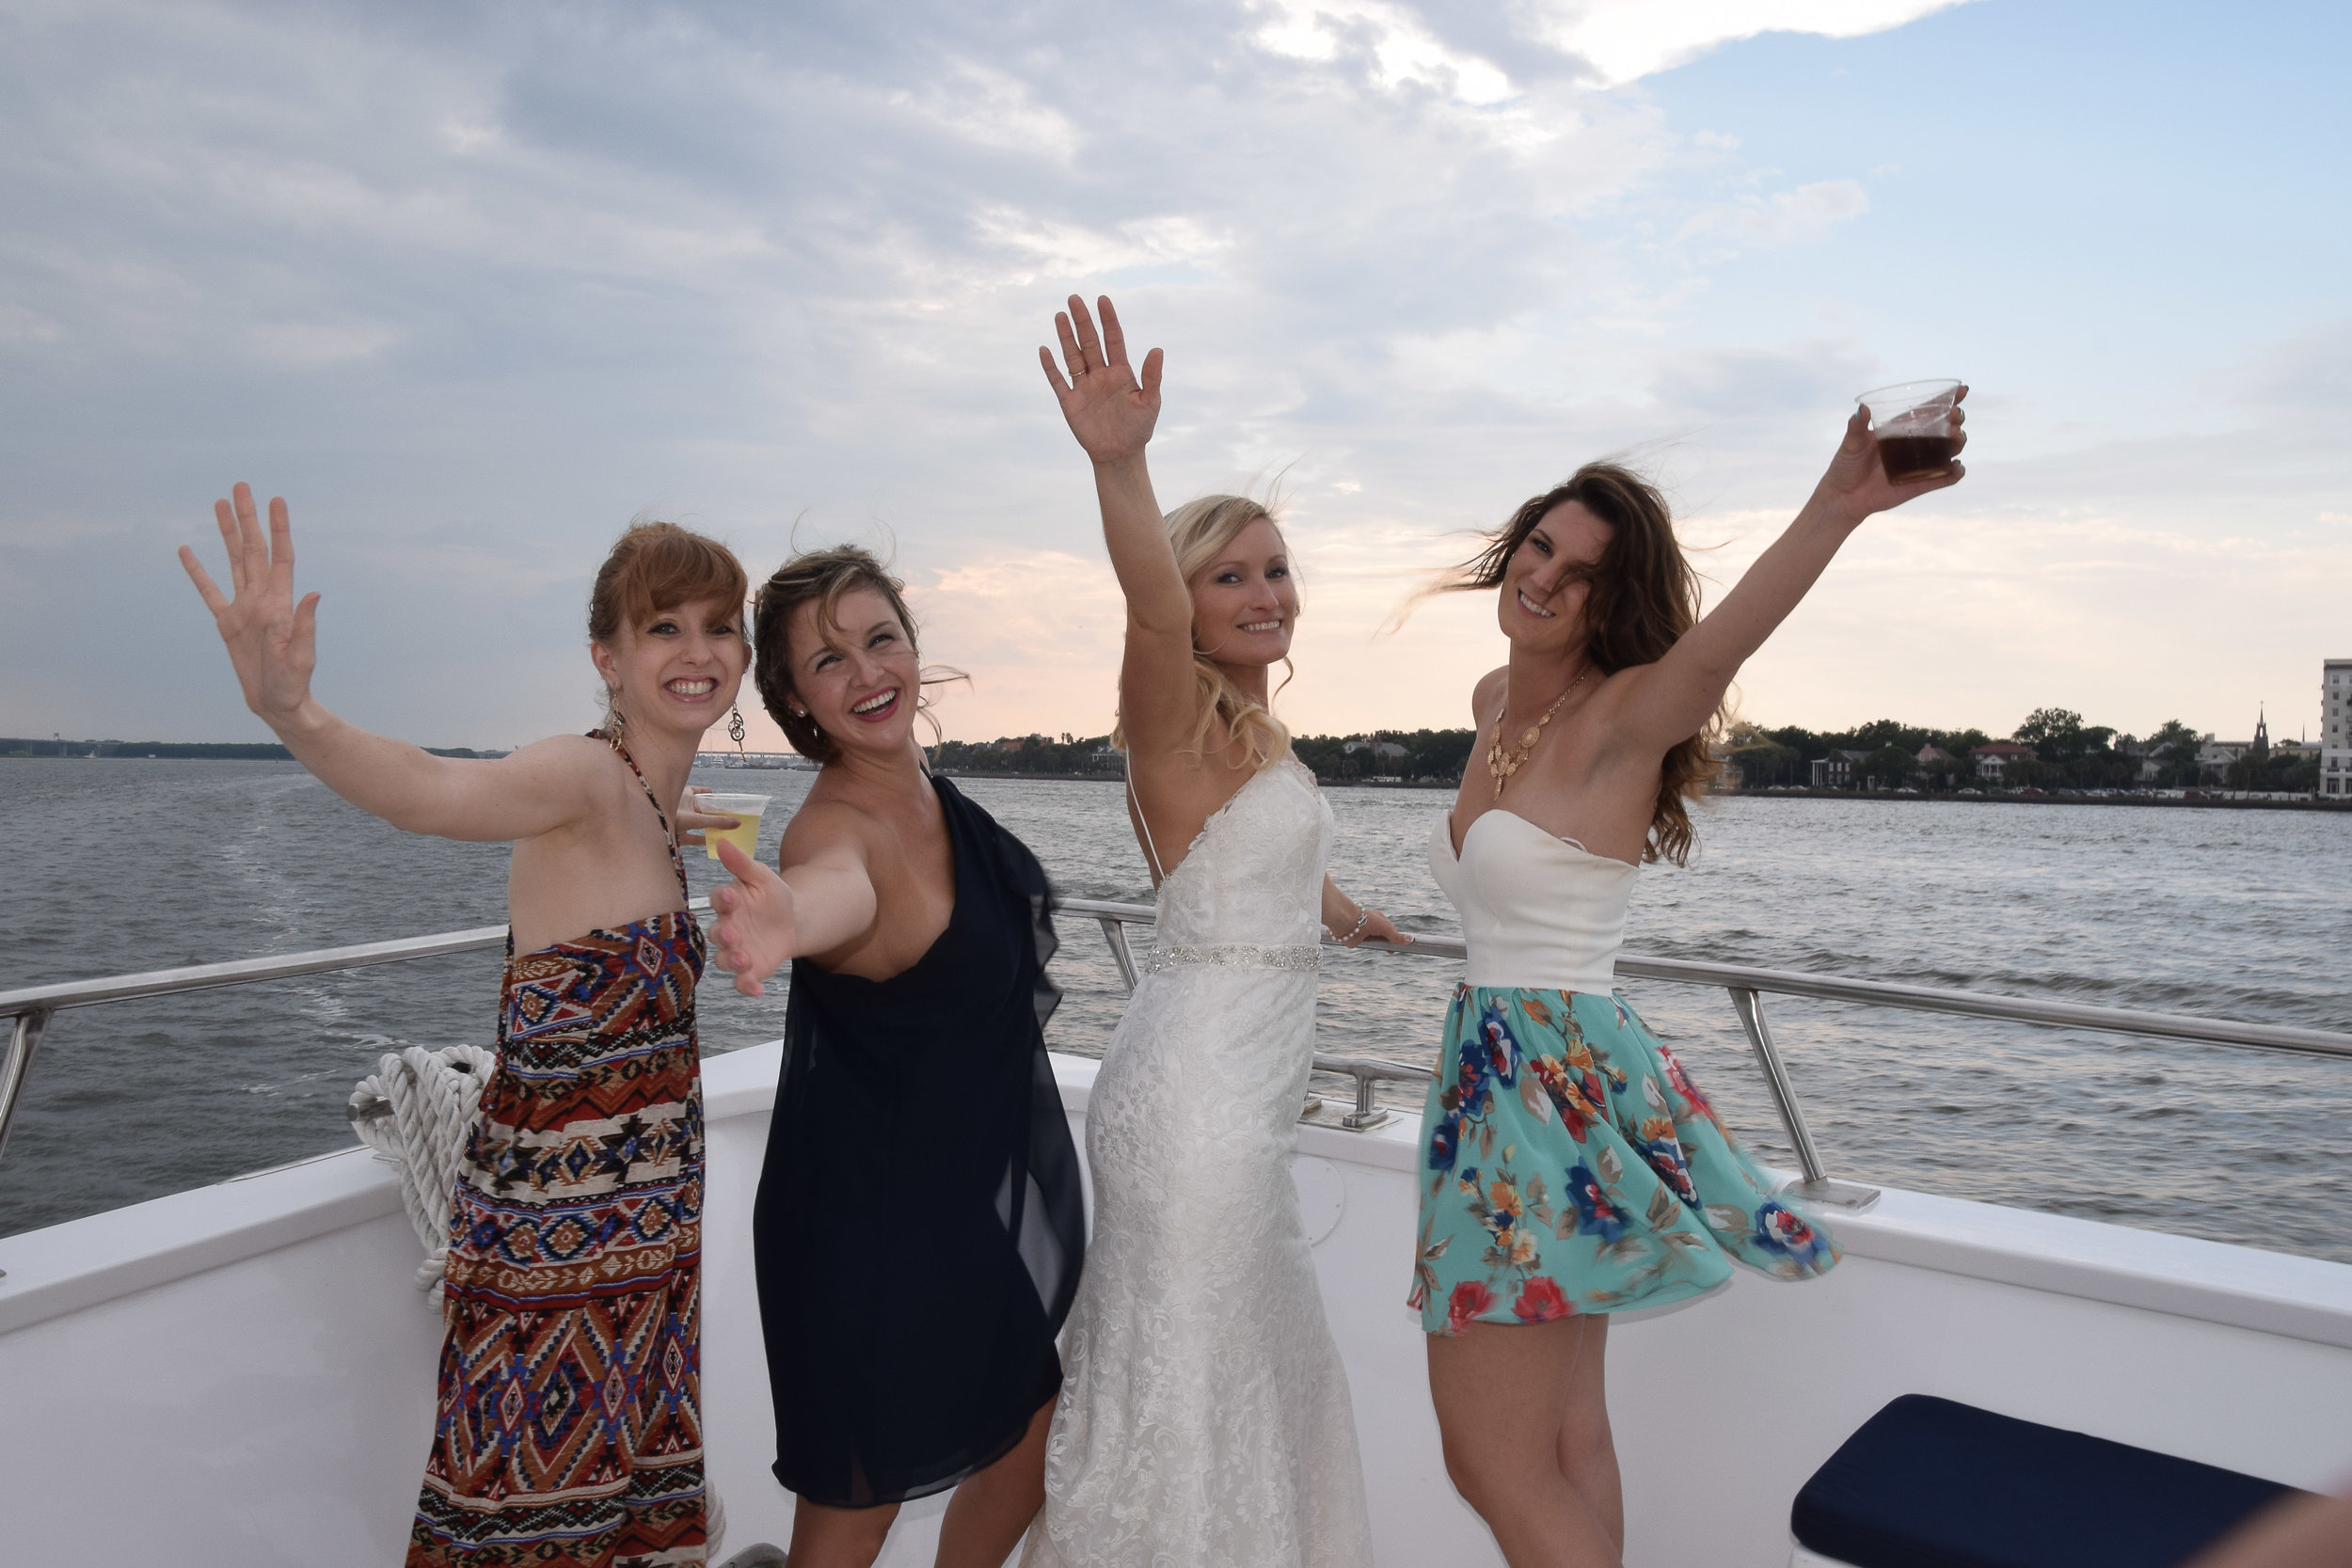 Bide and friends celebrating on the Carolina Girl.